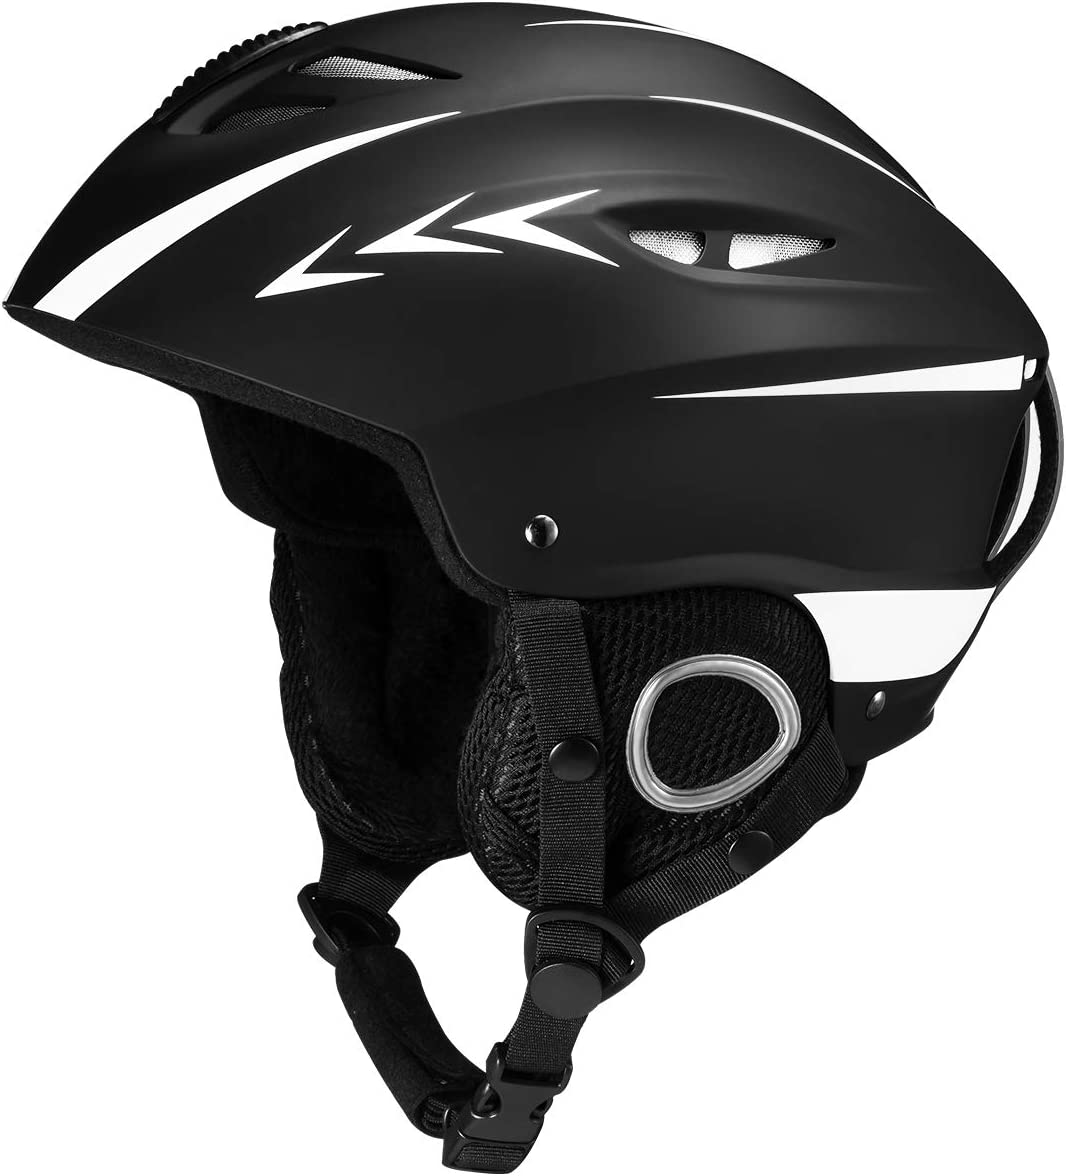 OMORC Ski Helmet,Snowboard Helmet Snow Sports Helmet with ASTM Certified Safety,Removable Inner Padding Ear Pad Ski Helmet for All Season,Airflow Climate Control Adjustable Fit for Men,Women,L XL